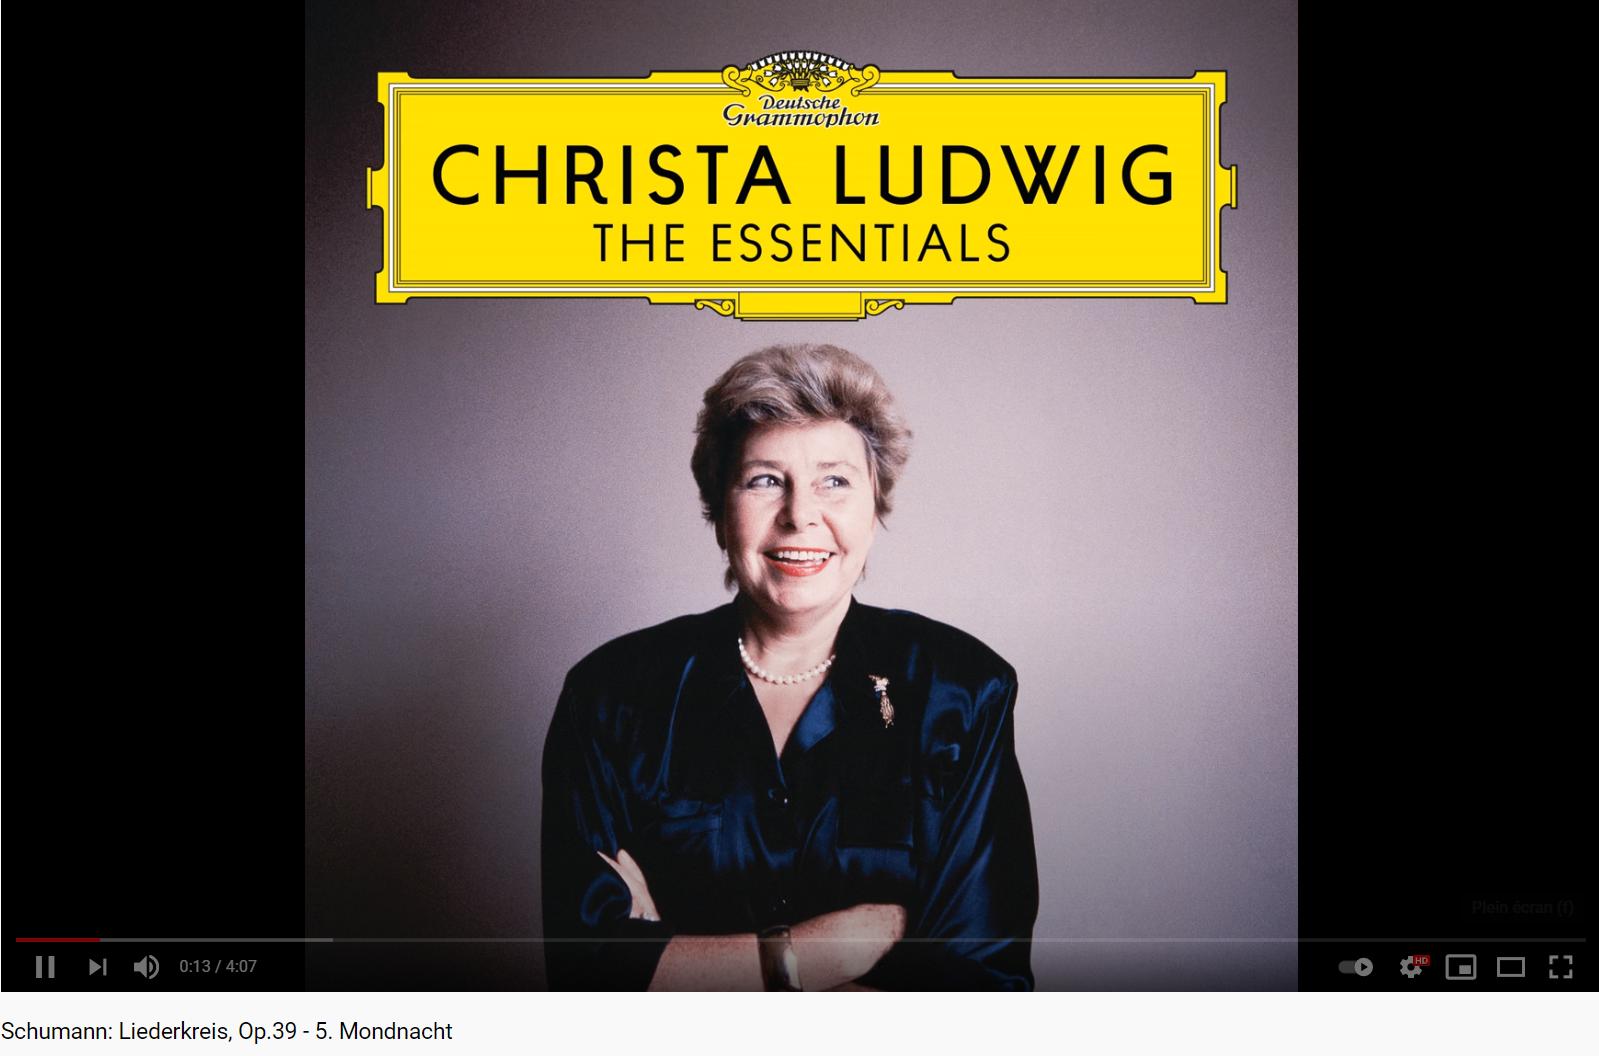 Schumann Liederkreis (Christa Ludwig)